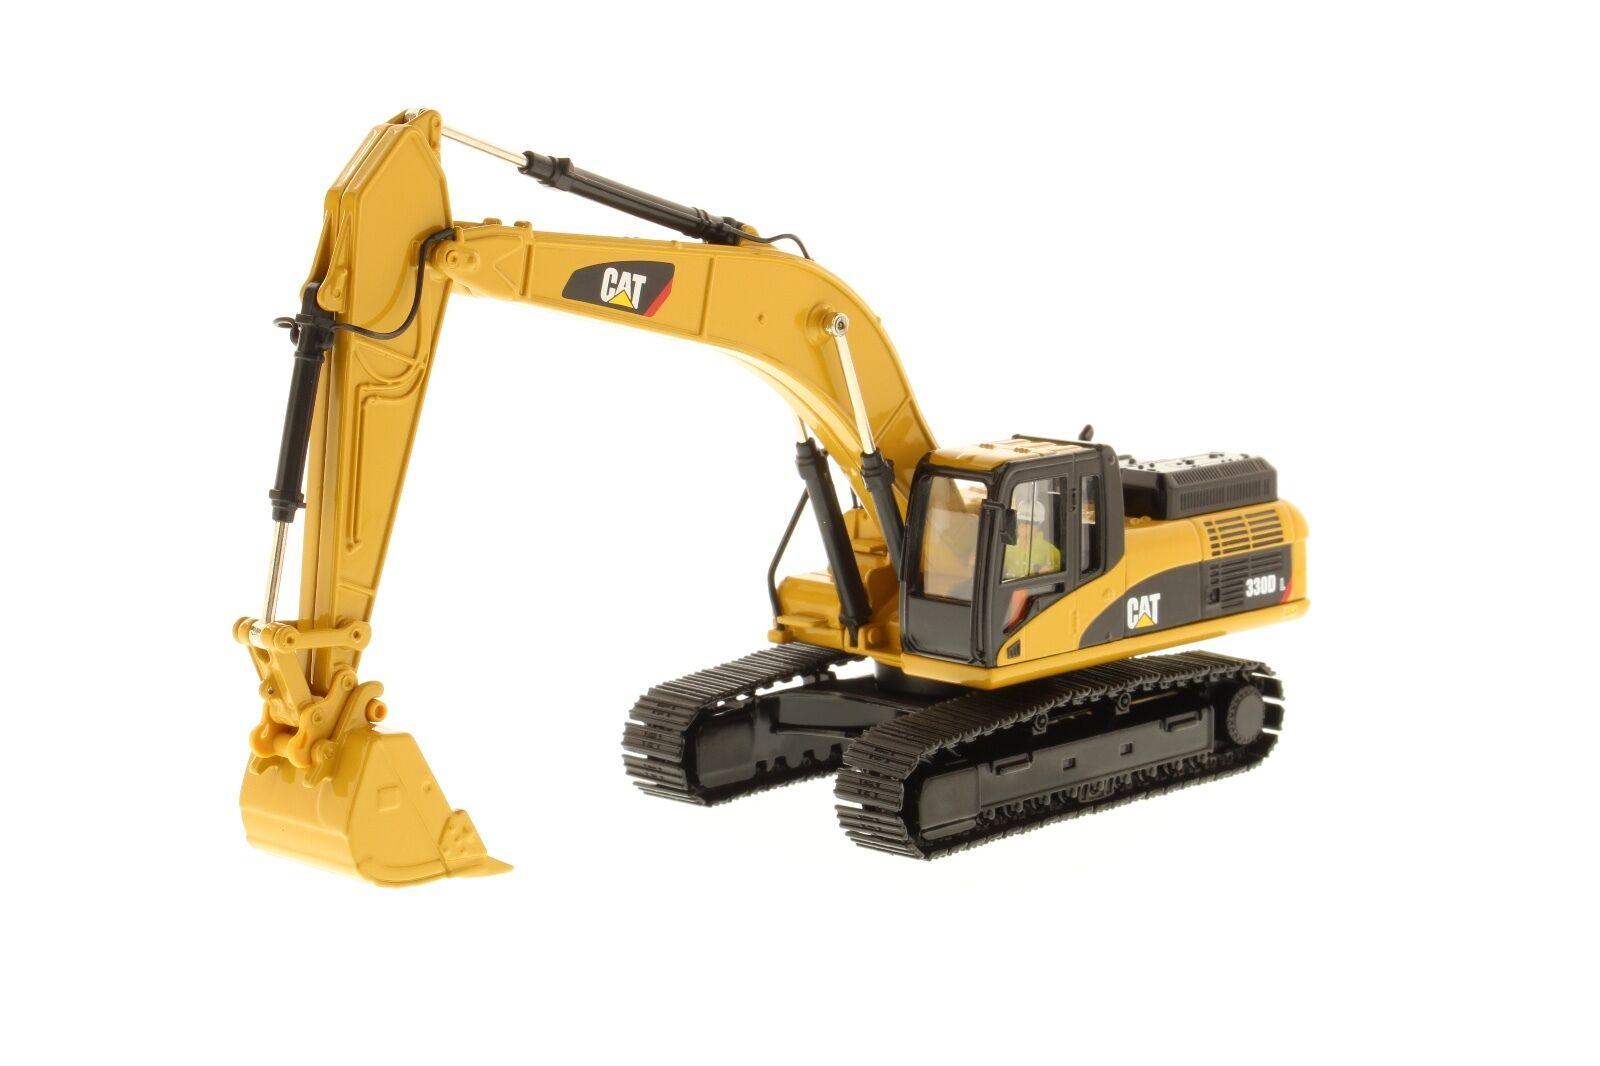 Caterpillar® 1 50 scale Cat 330D L Hydraulic  Excavator - Diecast Masters 85199  en ligne pas cher